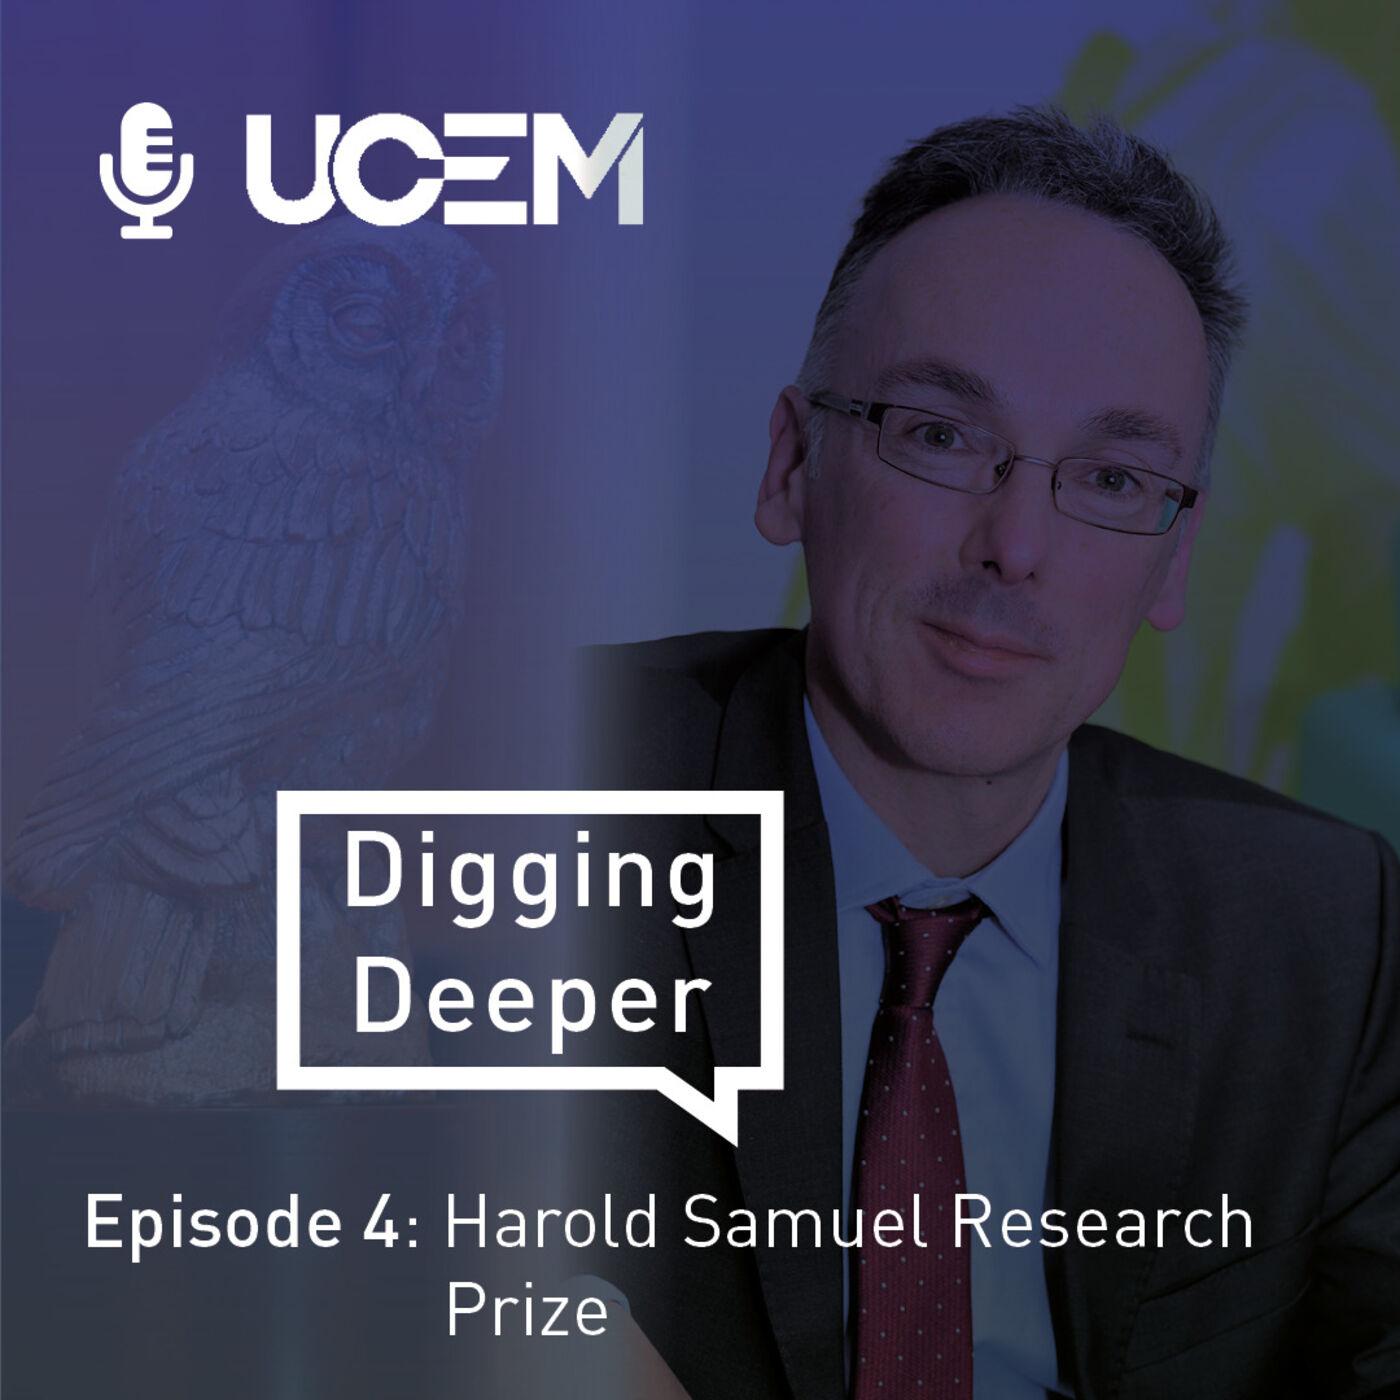 Digging Deeper - Episode 4: Harold Samuel Research Prize